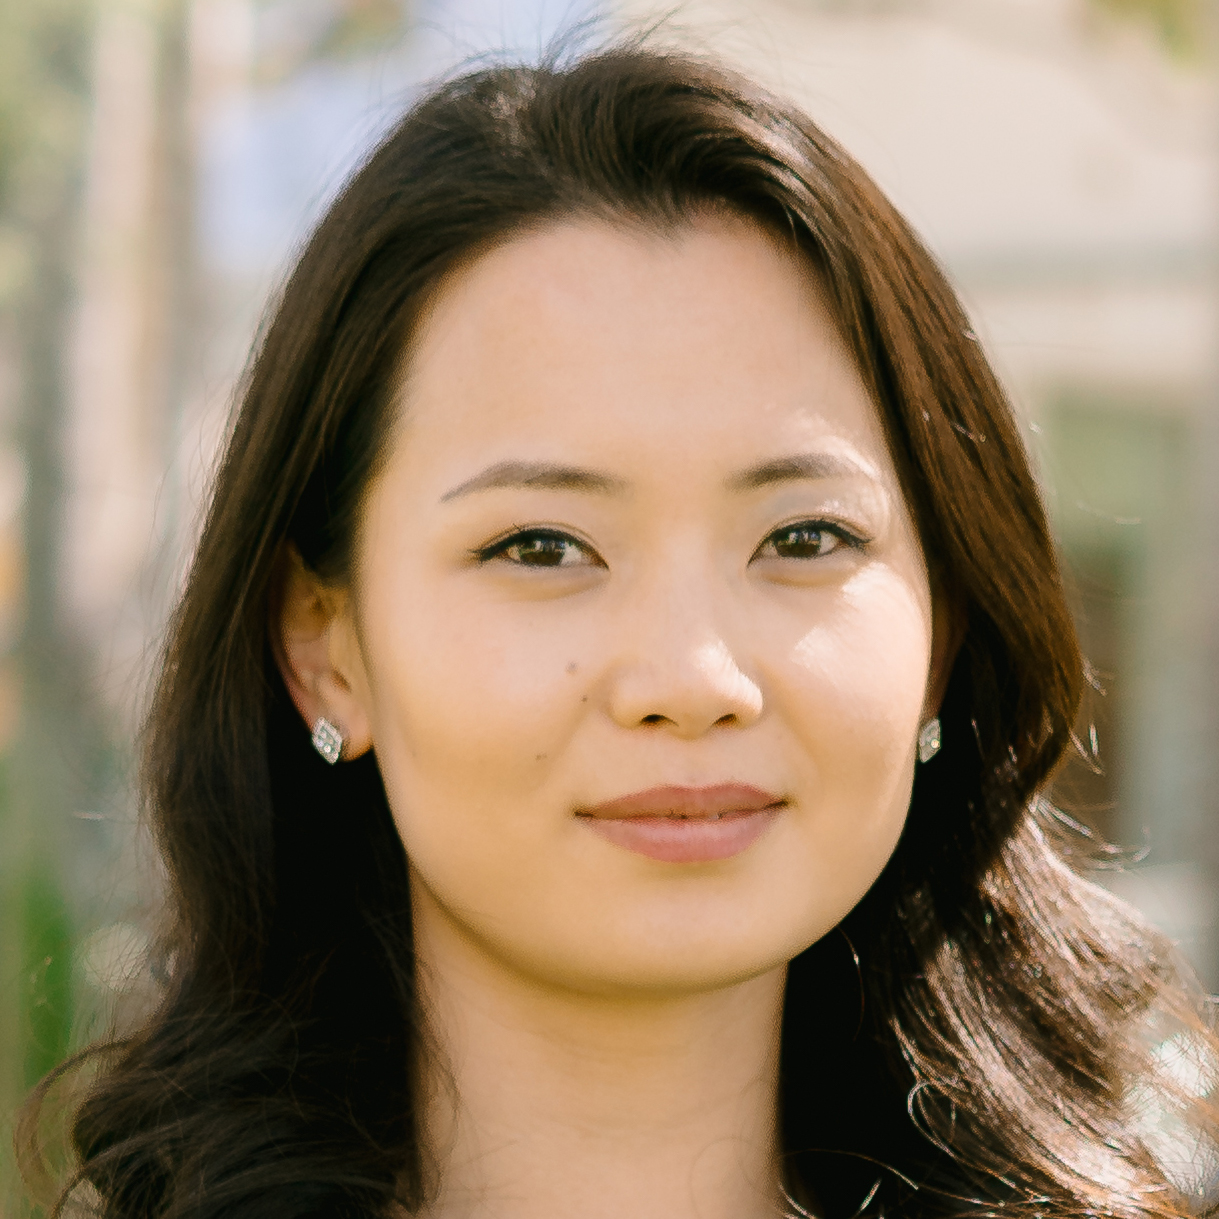 Bolortuya Otgonbaatar